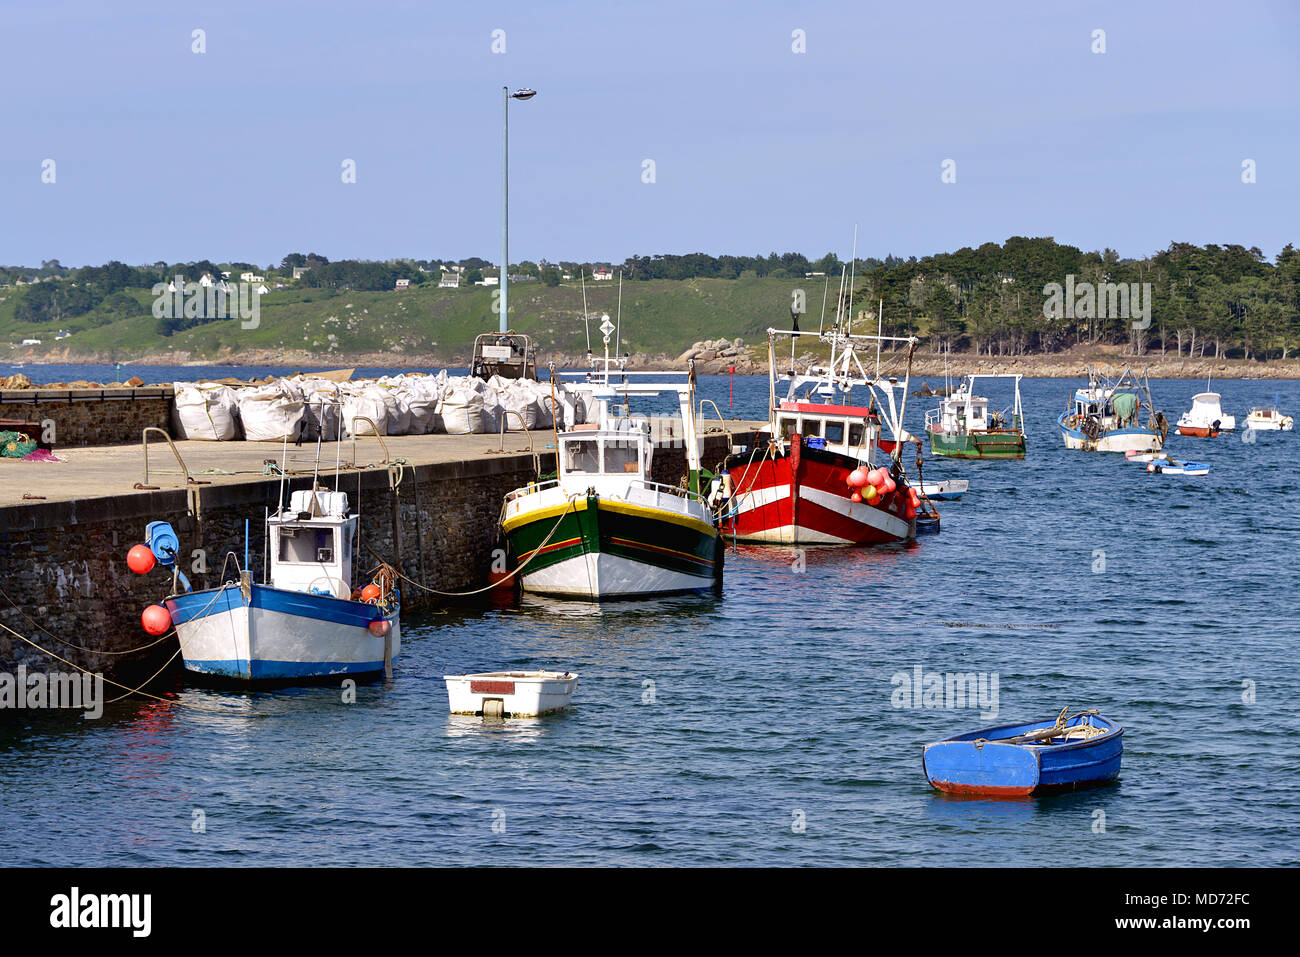 Port of Trédrez-Locquémeau, commune in the Côtes-d'Armor department of Brittany in northwestern France Stock Photo